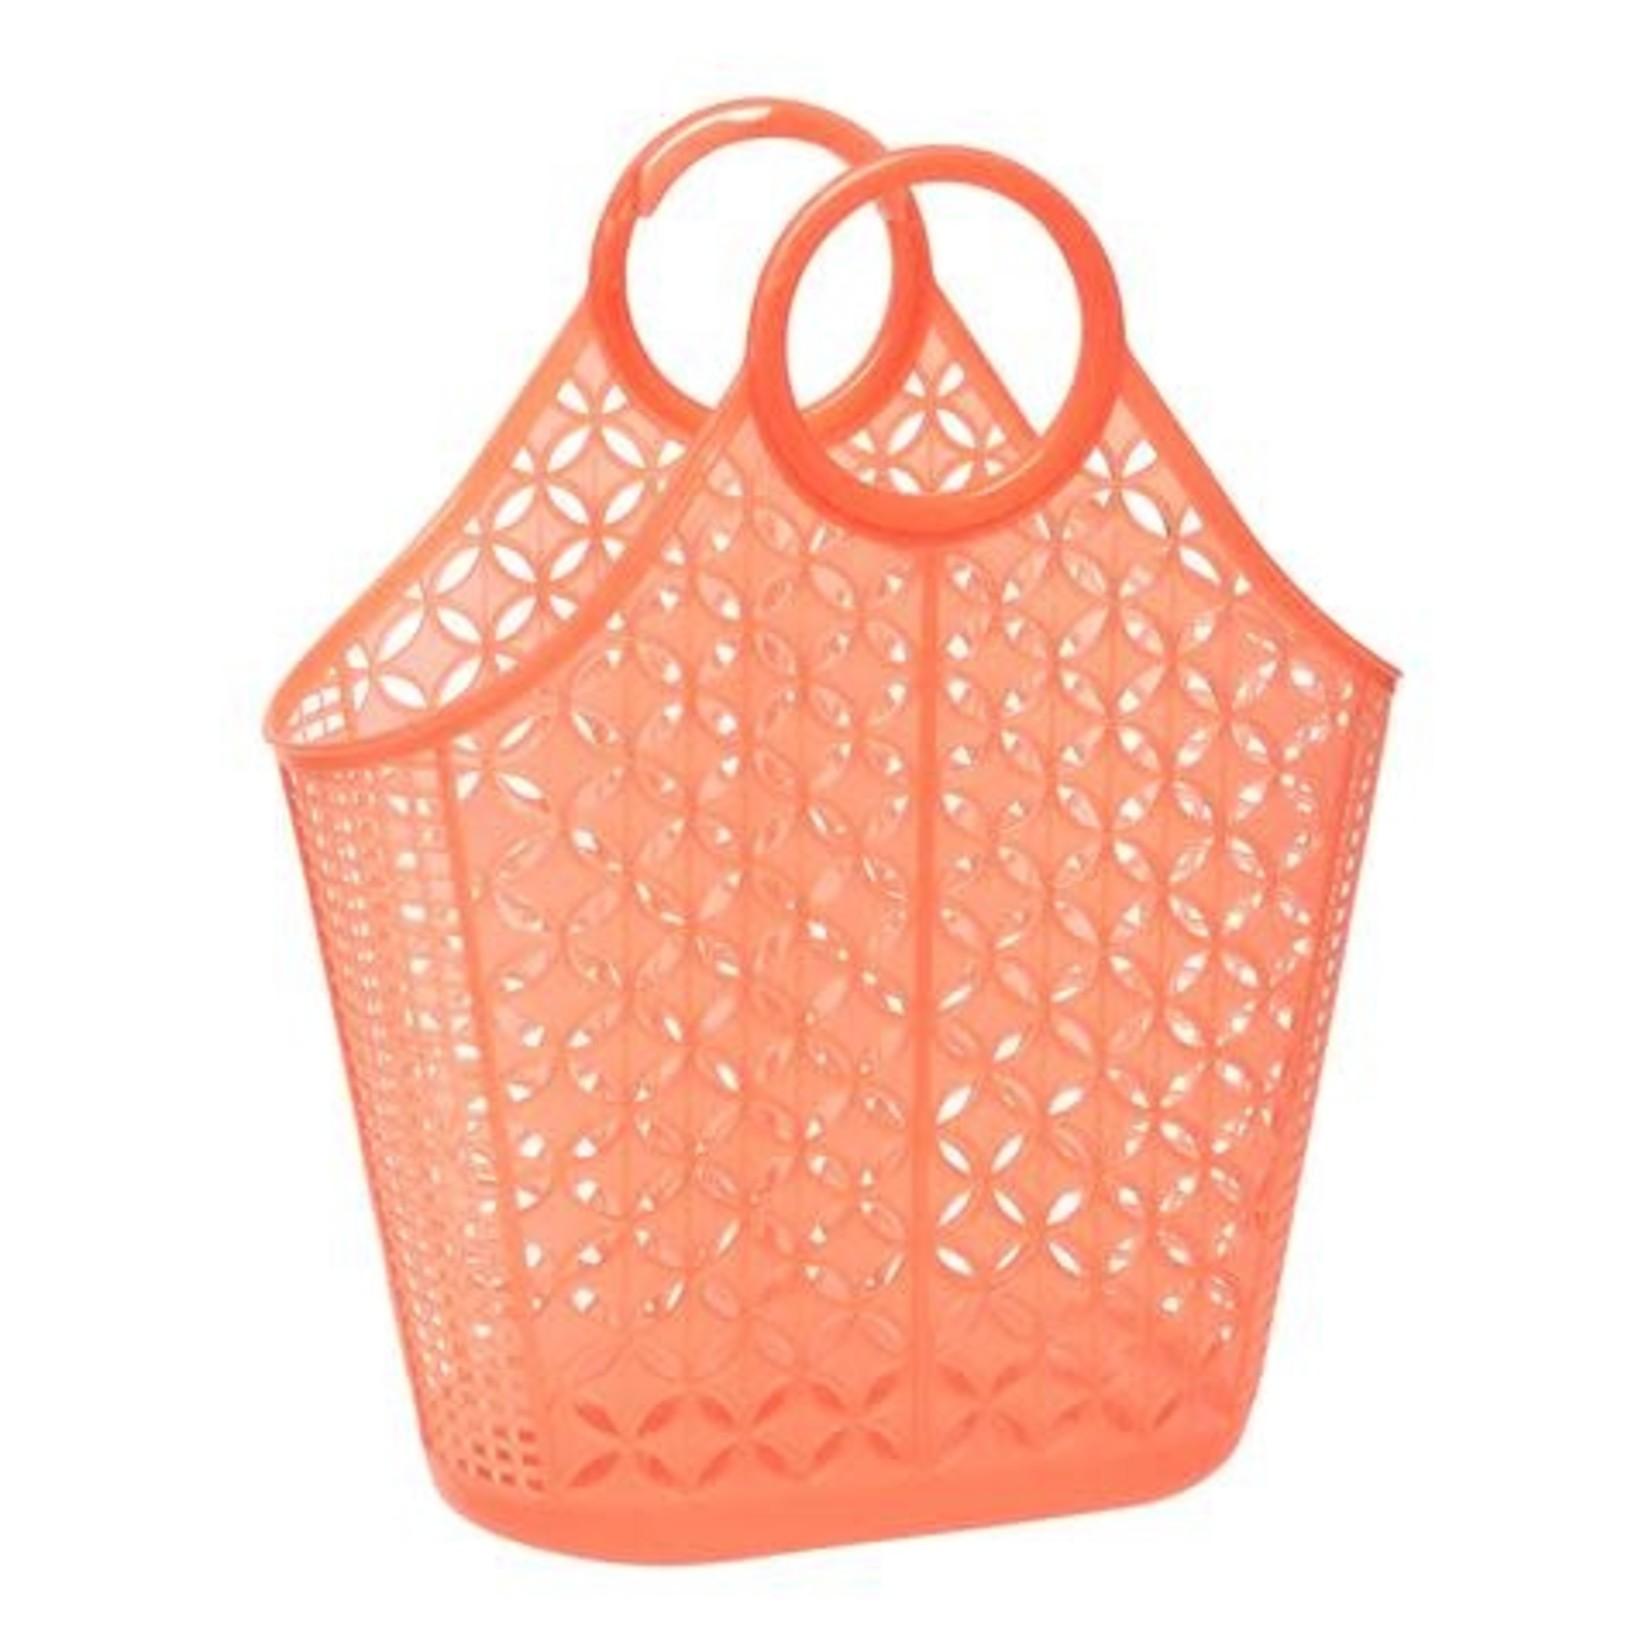 Sun Jellies Atomic Tote - Neon Orange